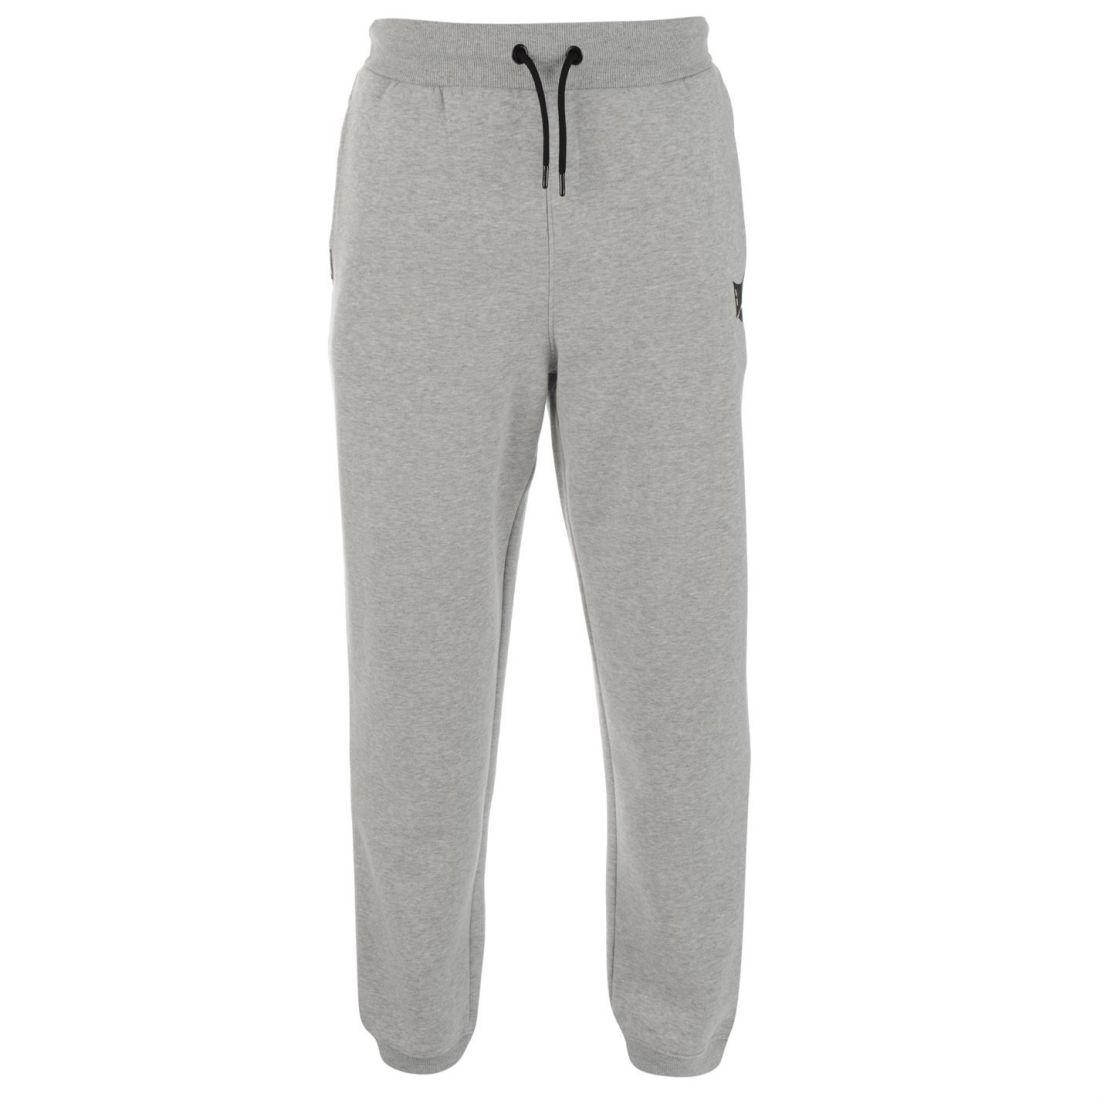 40170cd13cf591 Everlast Mens Jogging Bottoms Fleece Trousers Pants Warm Drawstring ...